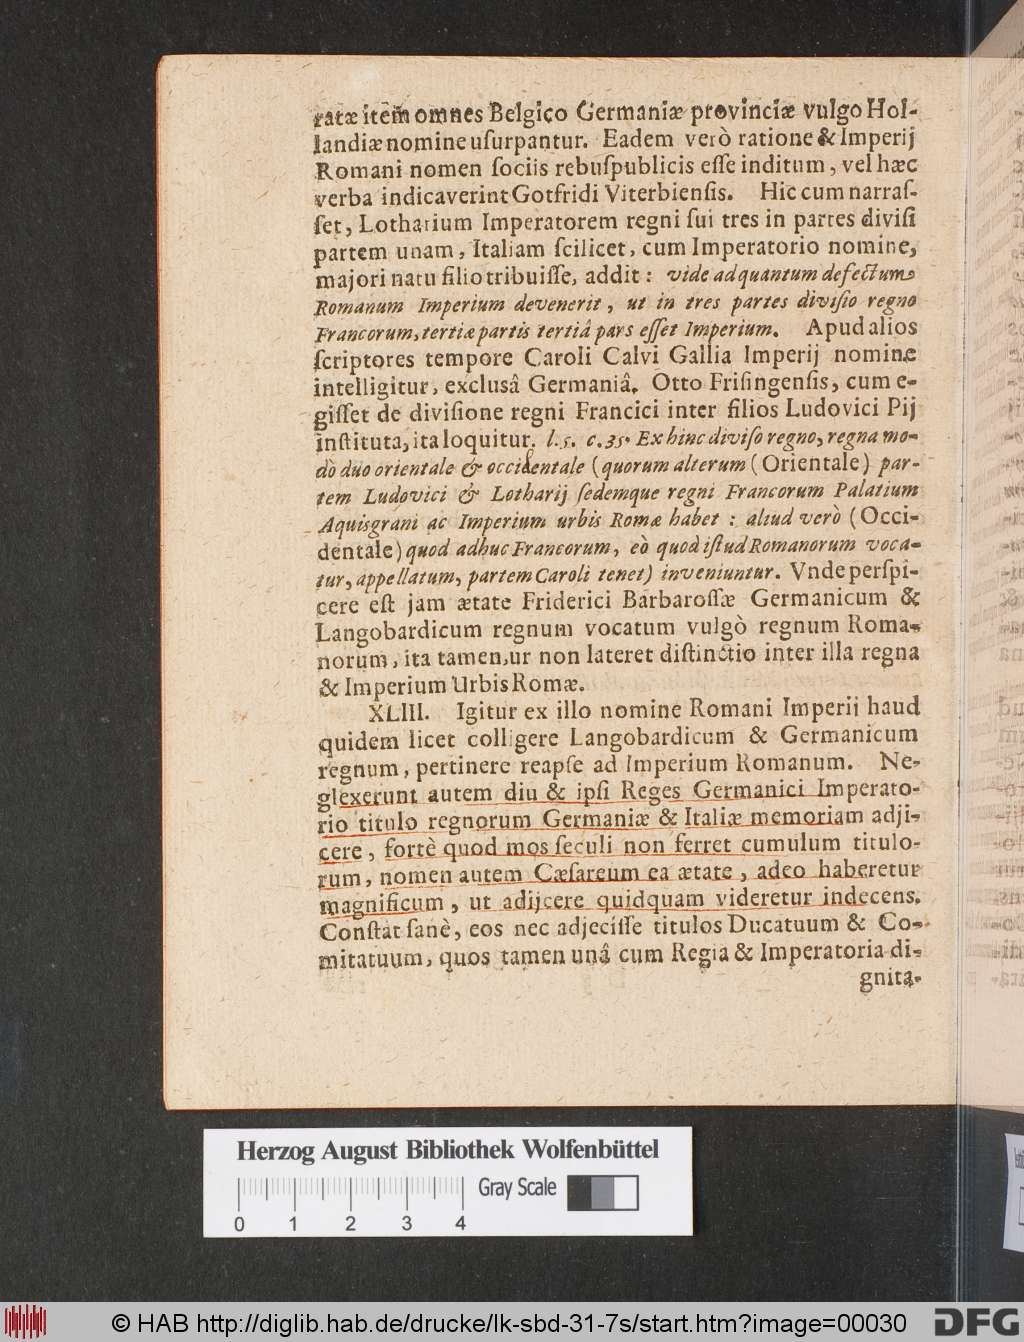 http://diglib.hab.de/drucke/lk-sbd-31-7s/00030.jpg